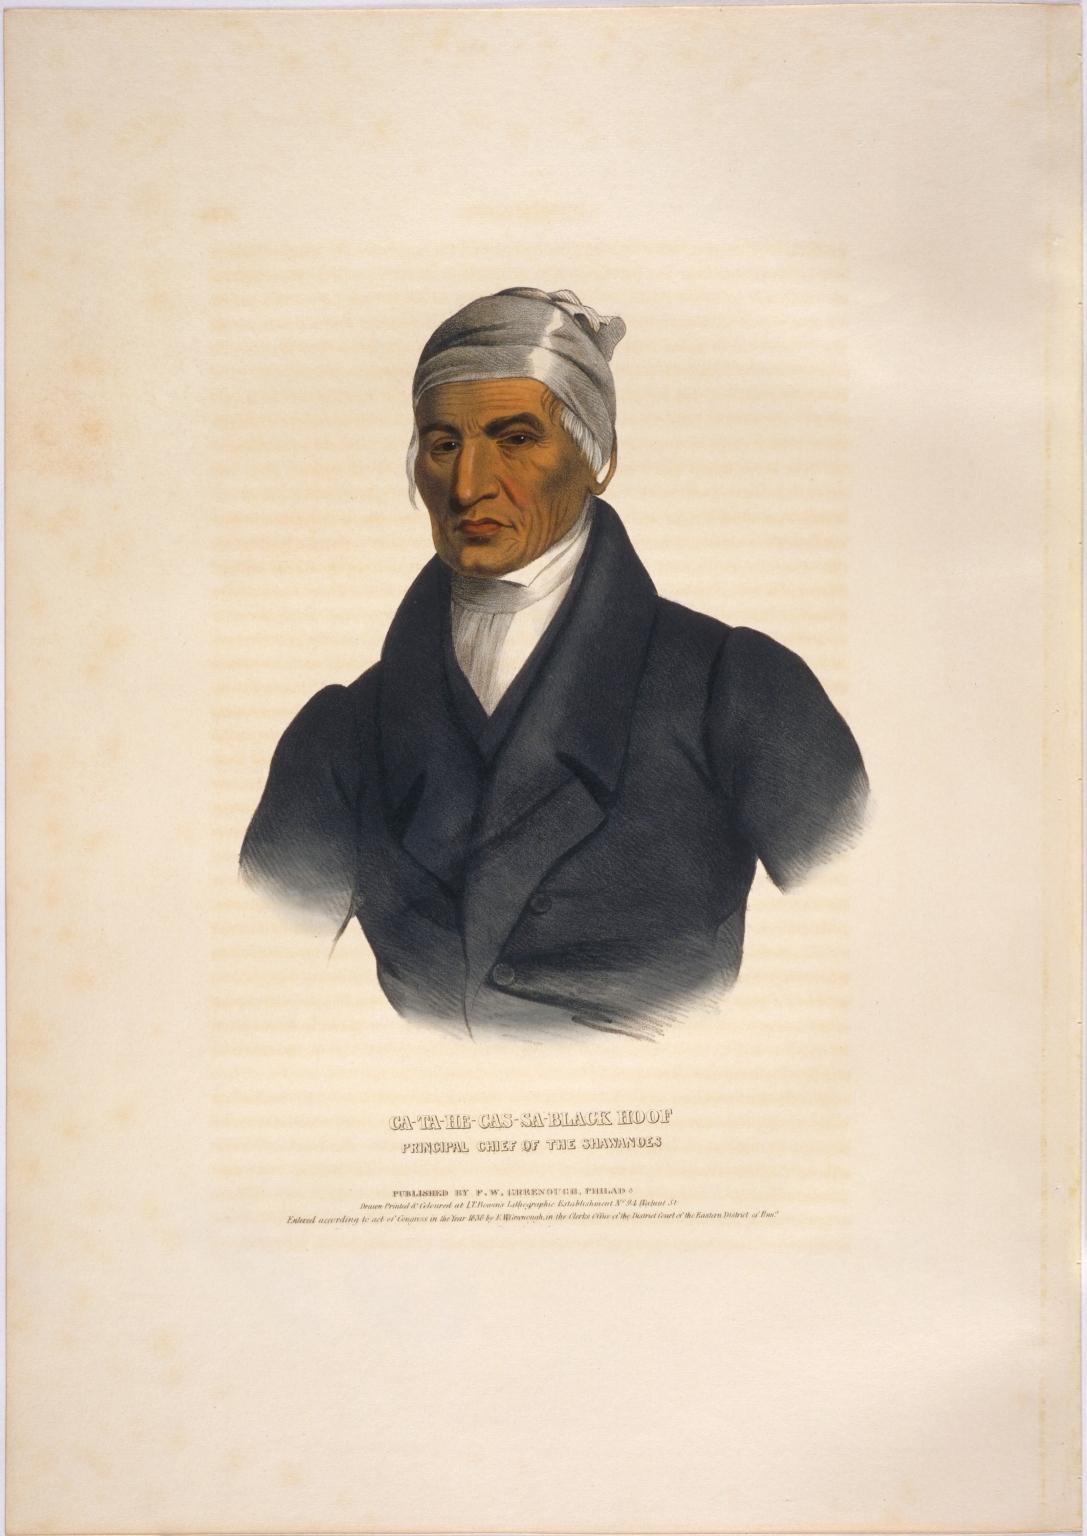 Ca-ta-he-cas-sa Black Hoof, principal chief of the Shawanoes